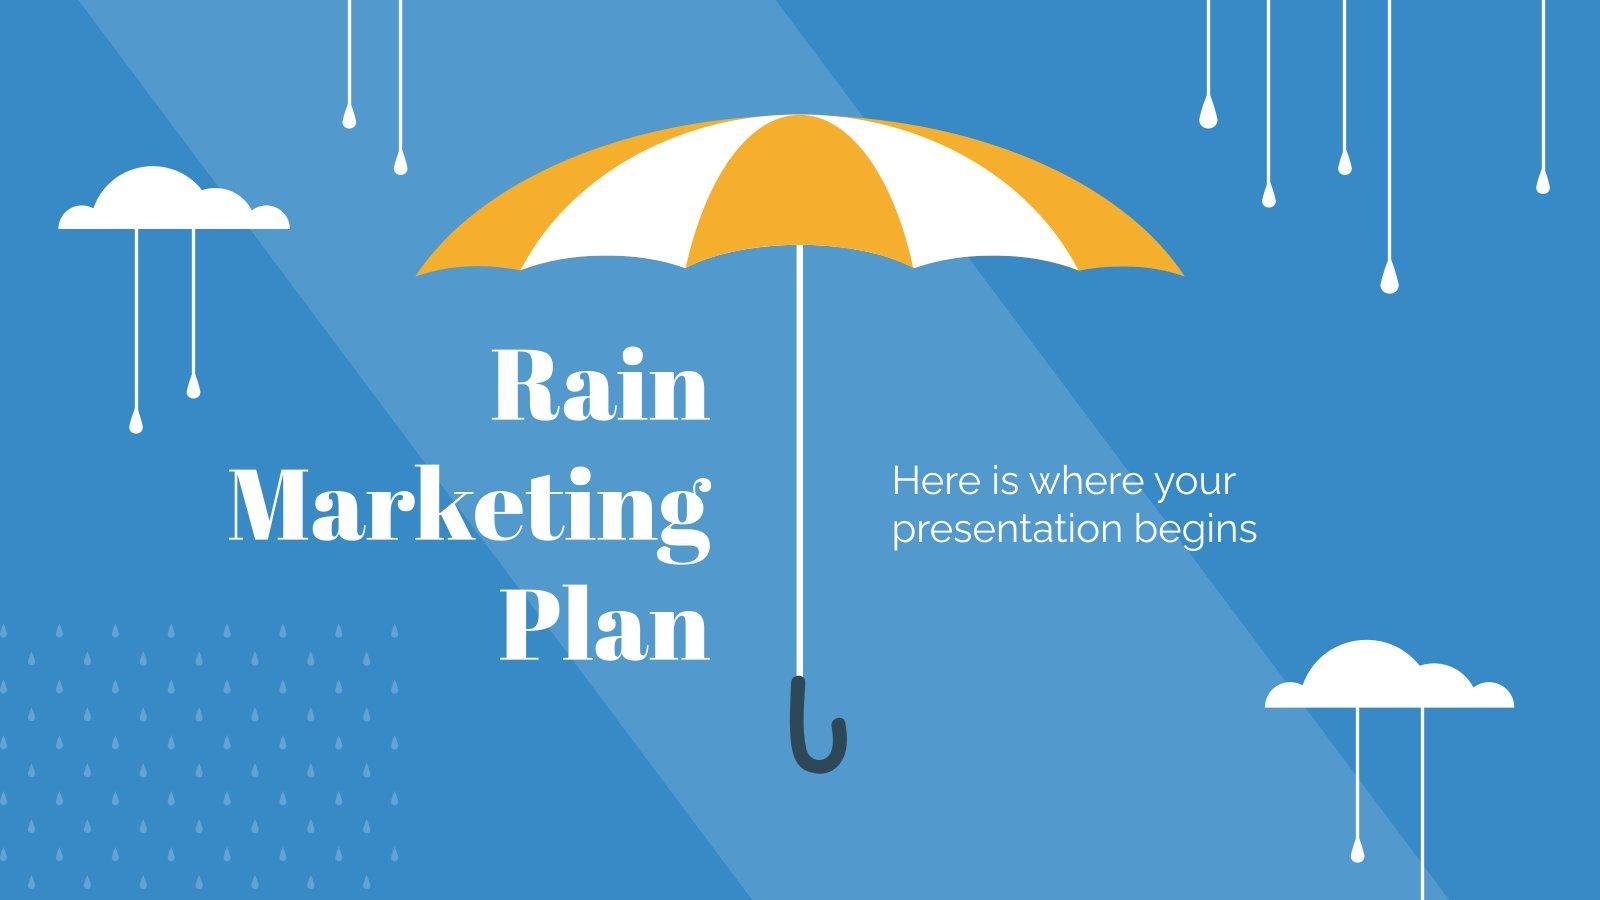 Rain Marketing Plan presentation template